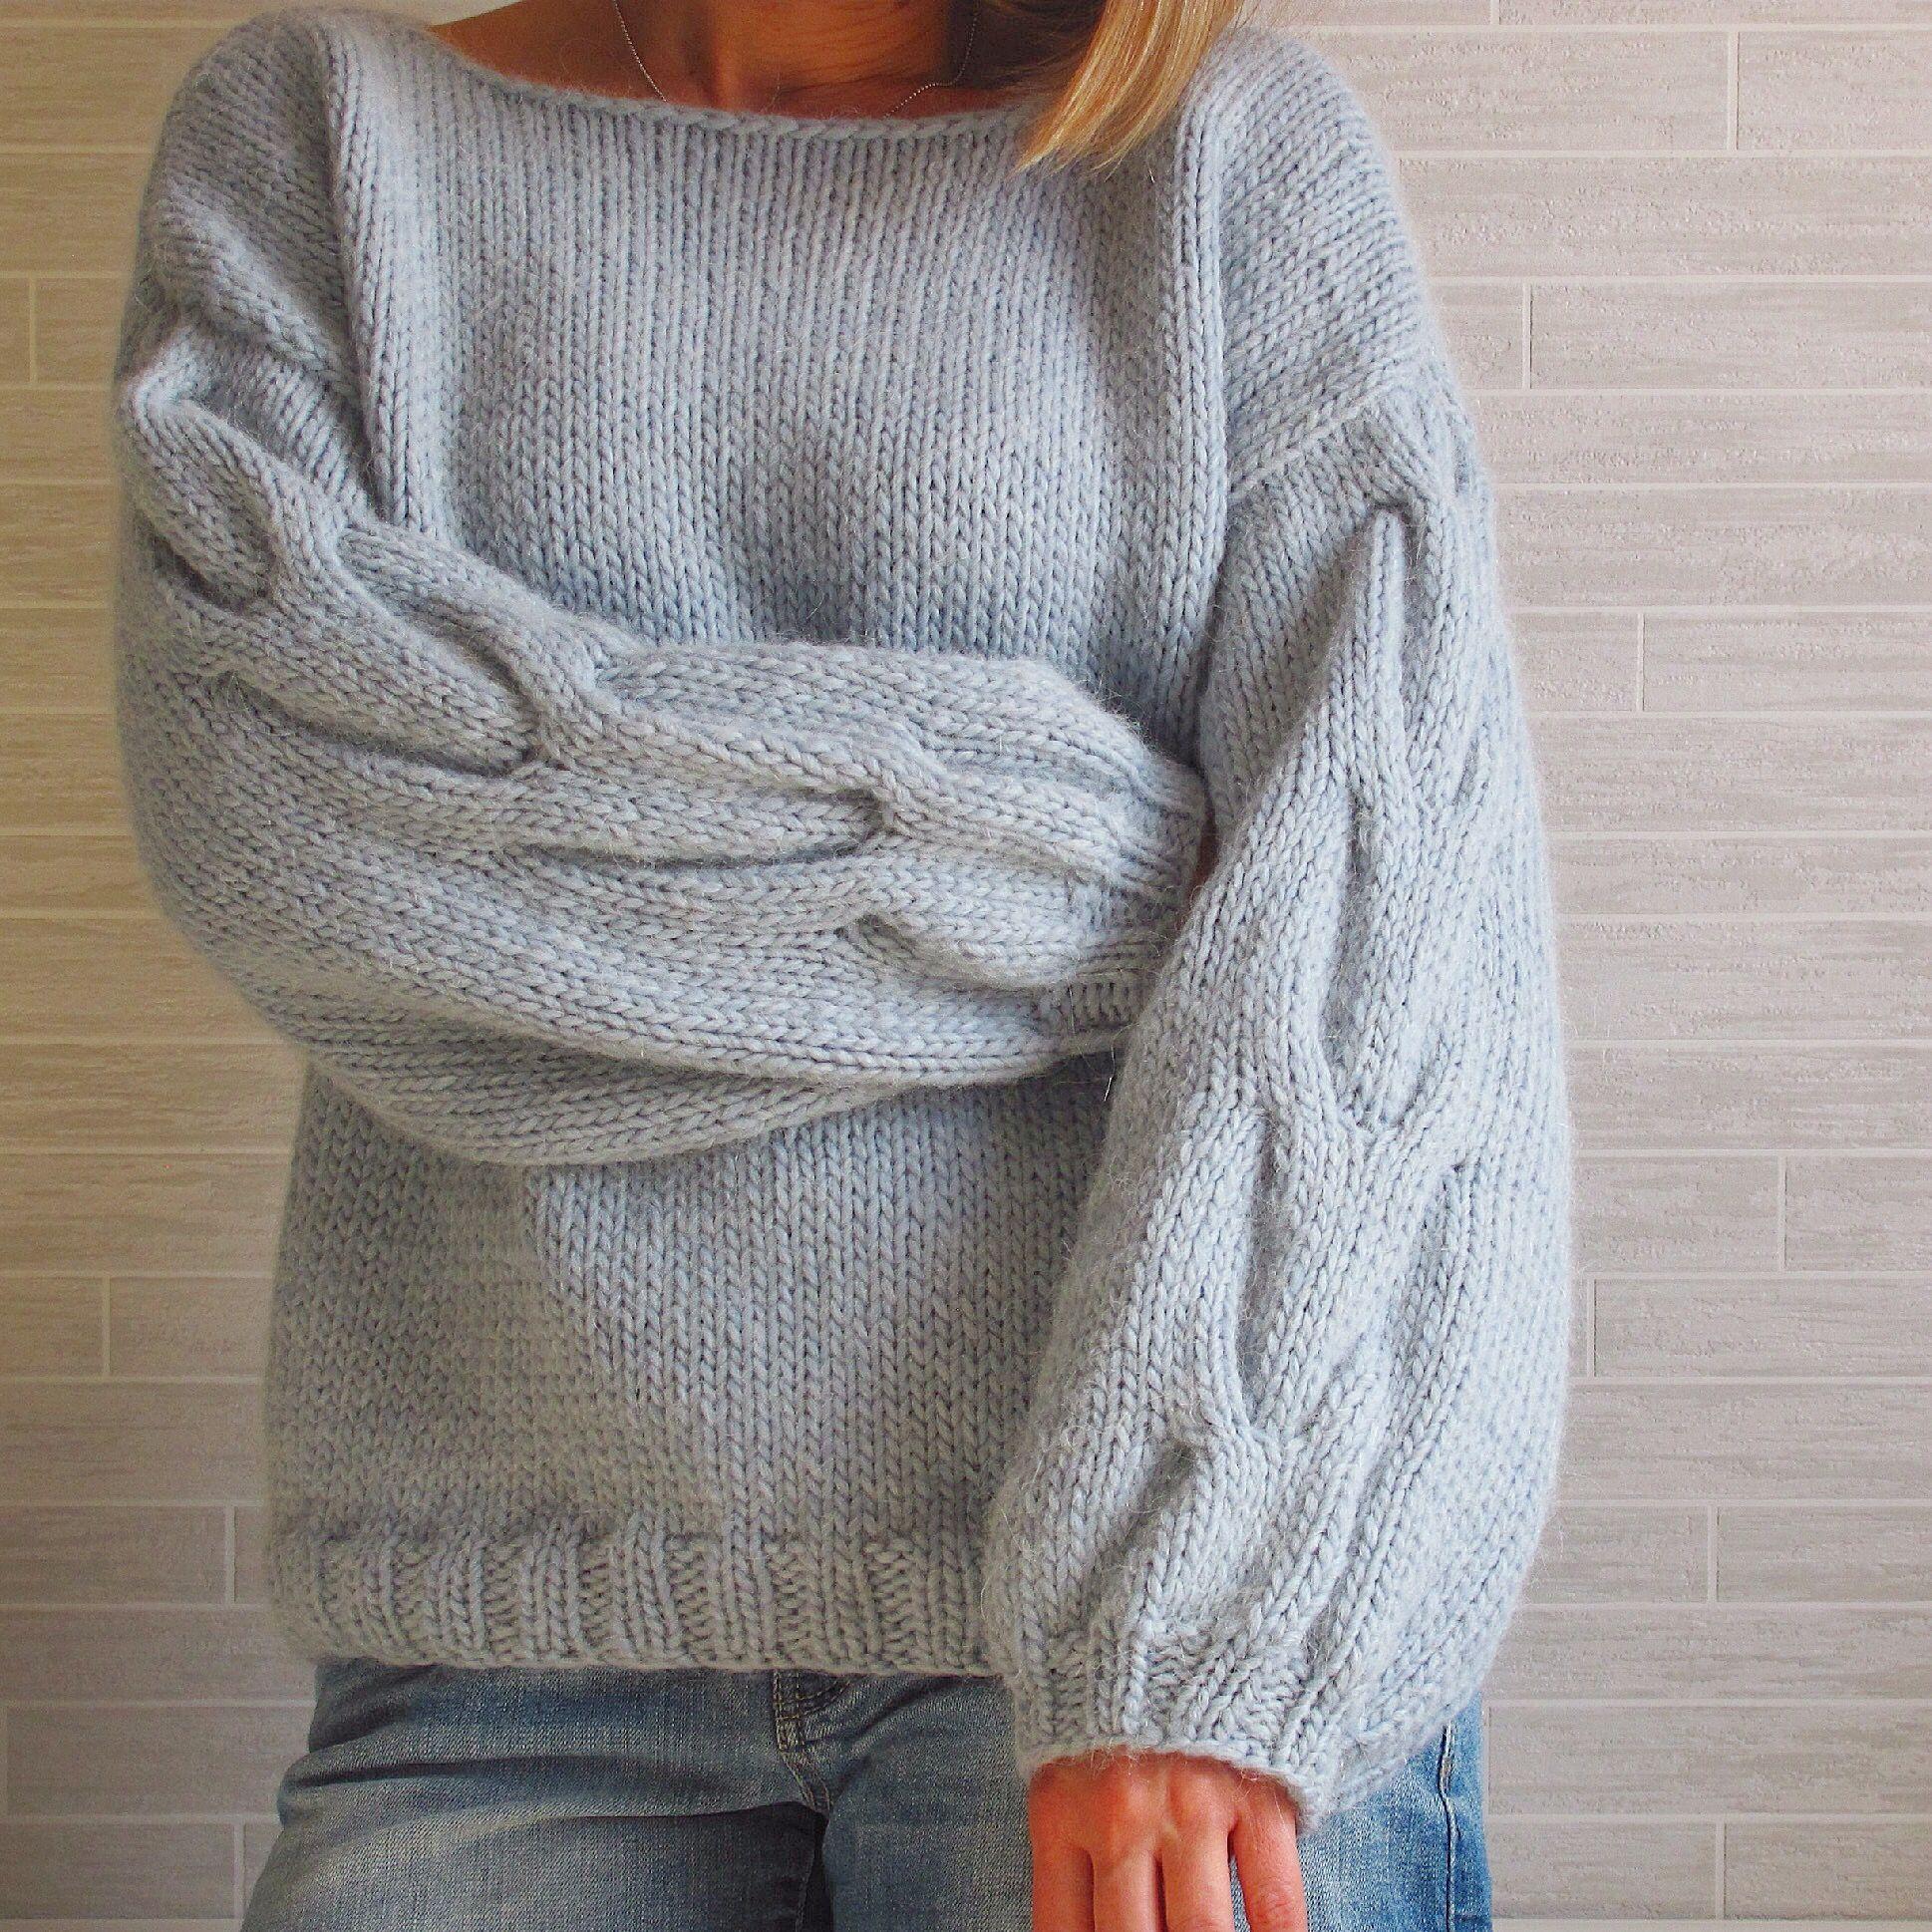 Cable sleeves | hook and needle | Pinterest | Adornos navidad ...